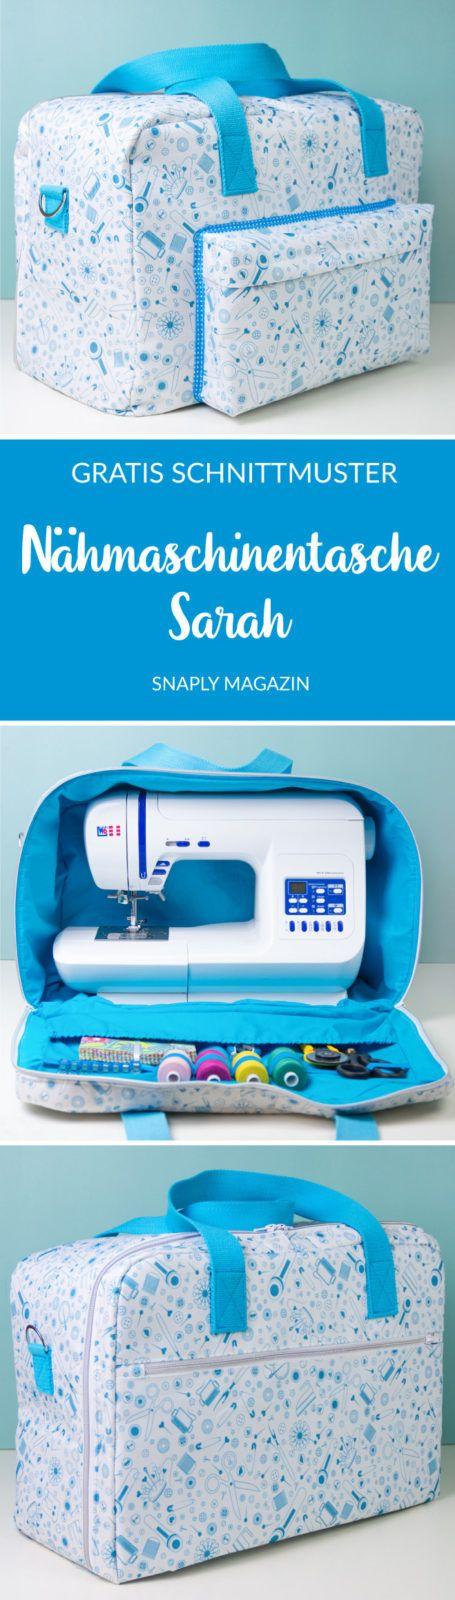 Gratis Schnittmuster: Nähmaschinentasche Sarah | Snaply-Magazin #freebookschnittmuster